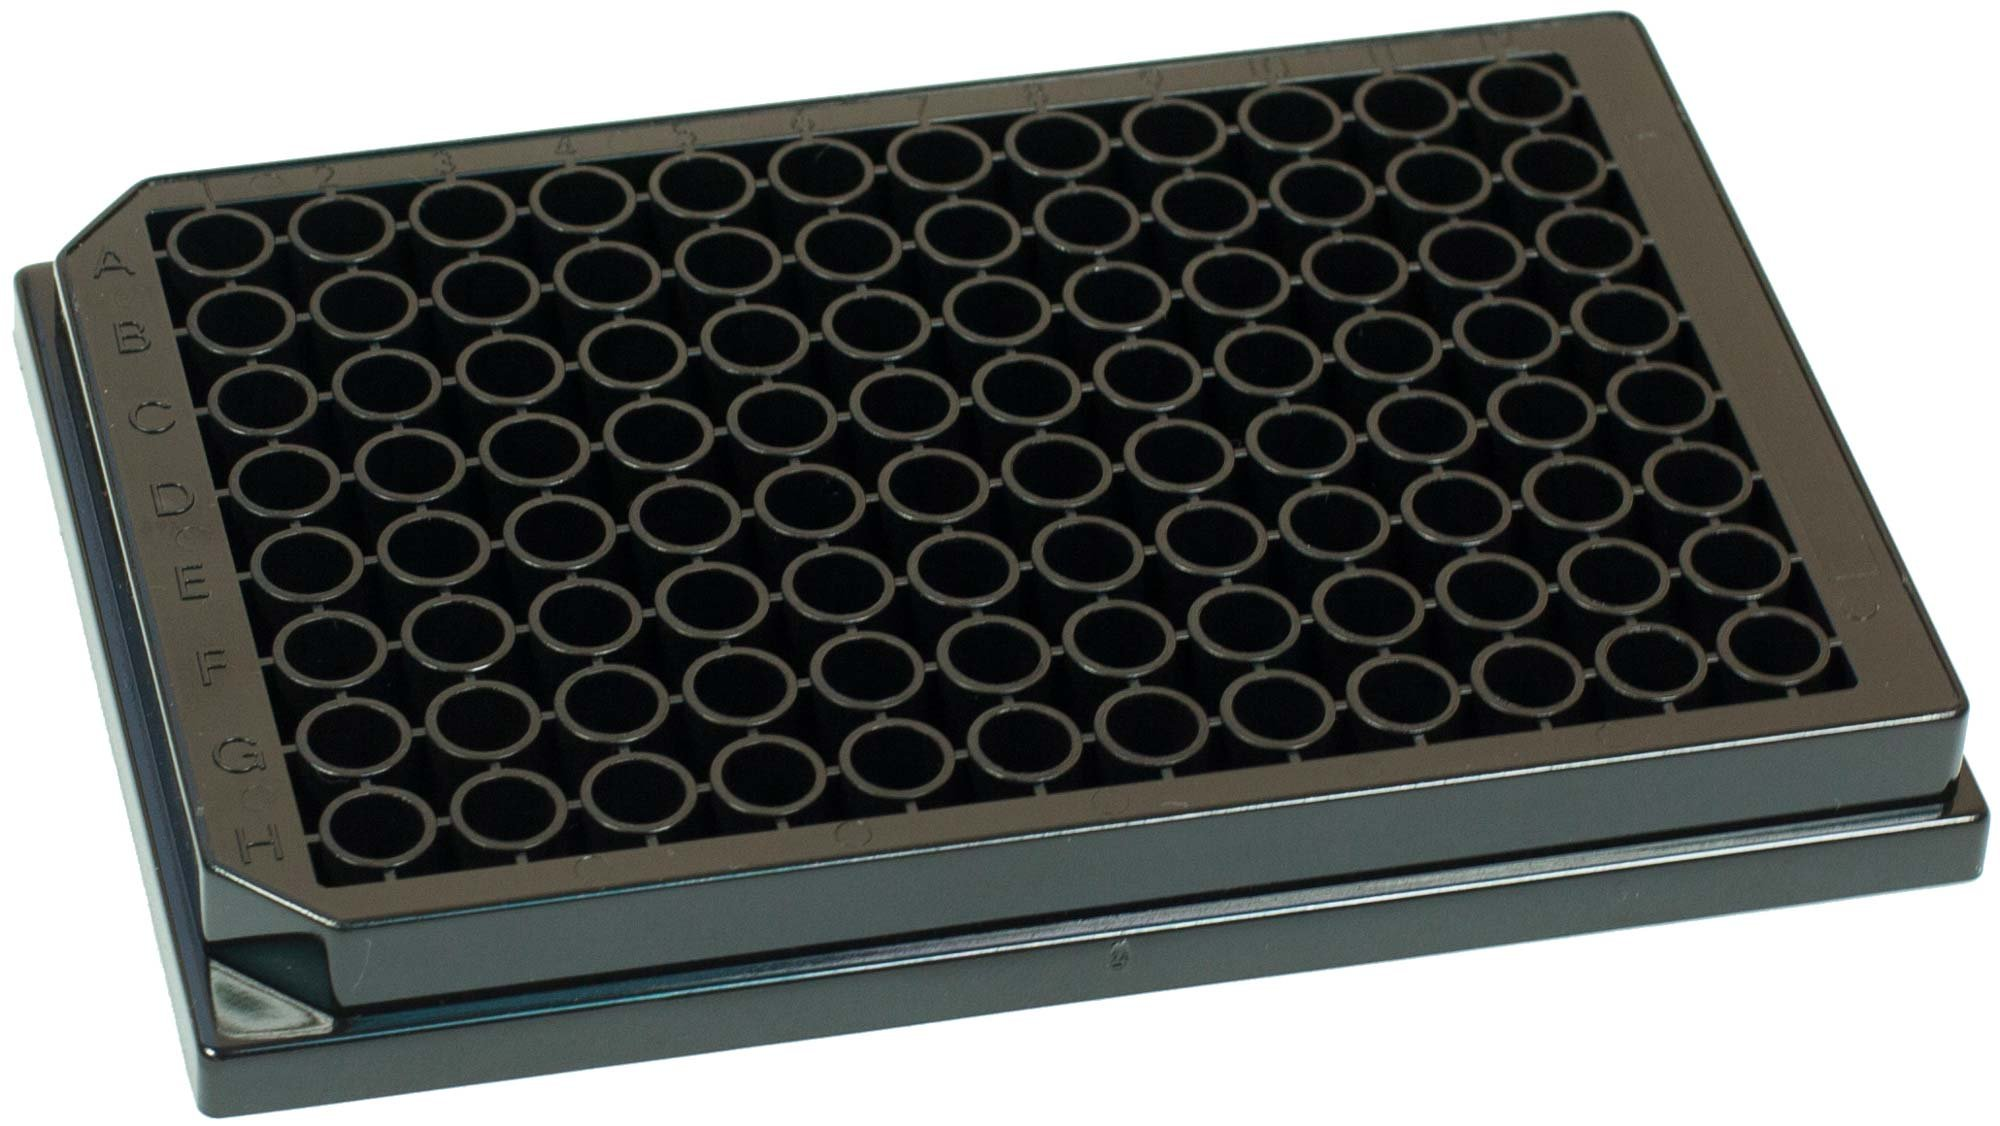 BRANDplates immunoGrade Non-Sterile Treated Surface 96-Well Plate - Black, Transparent F-Bottom